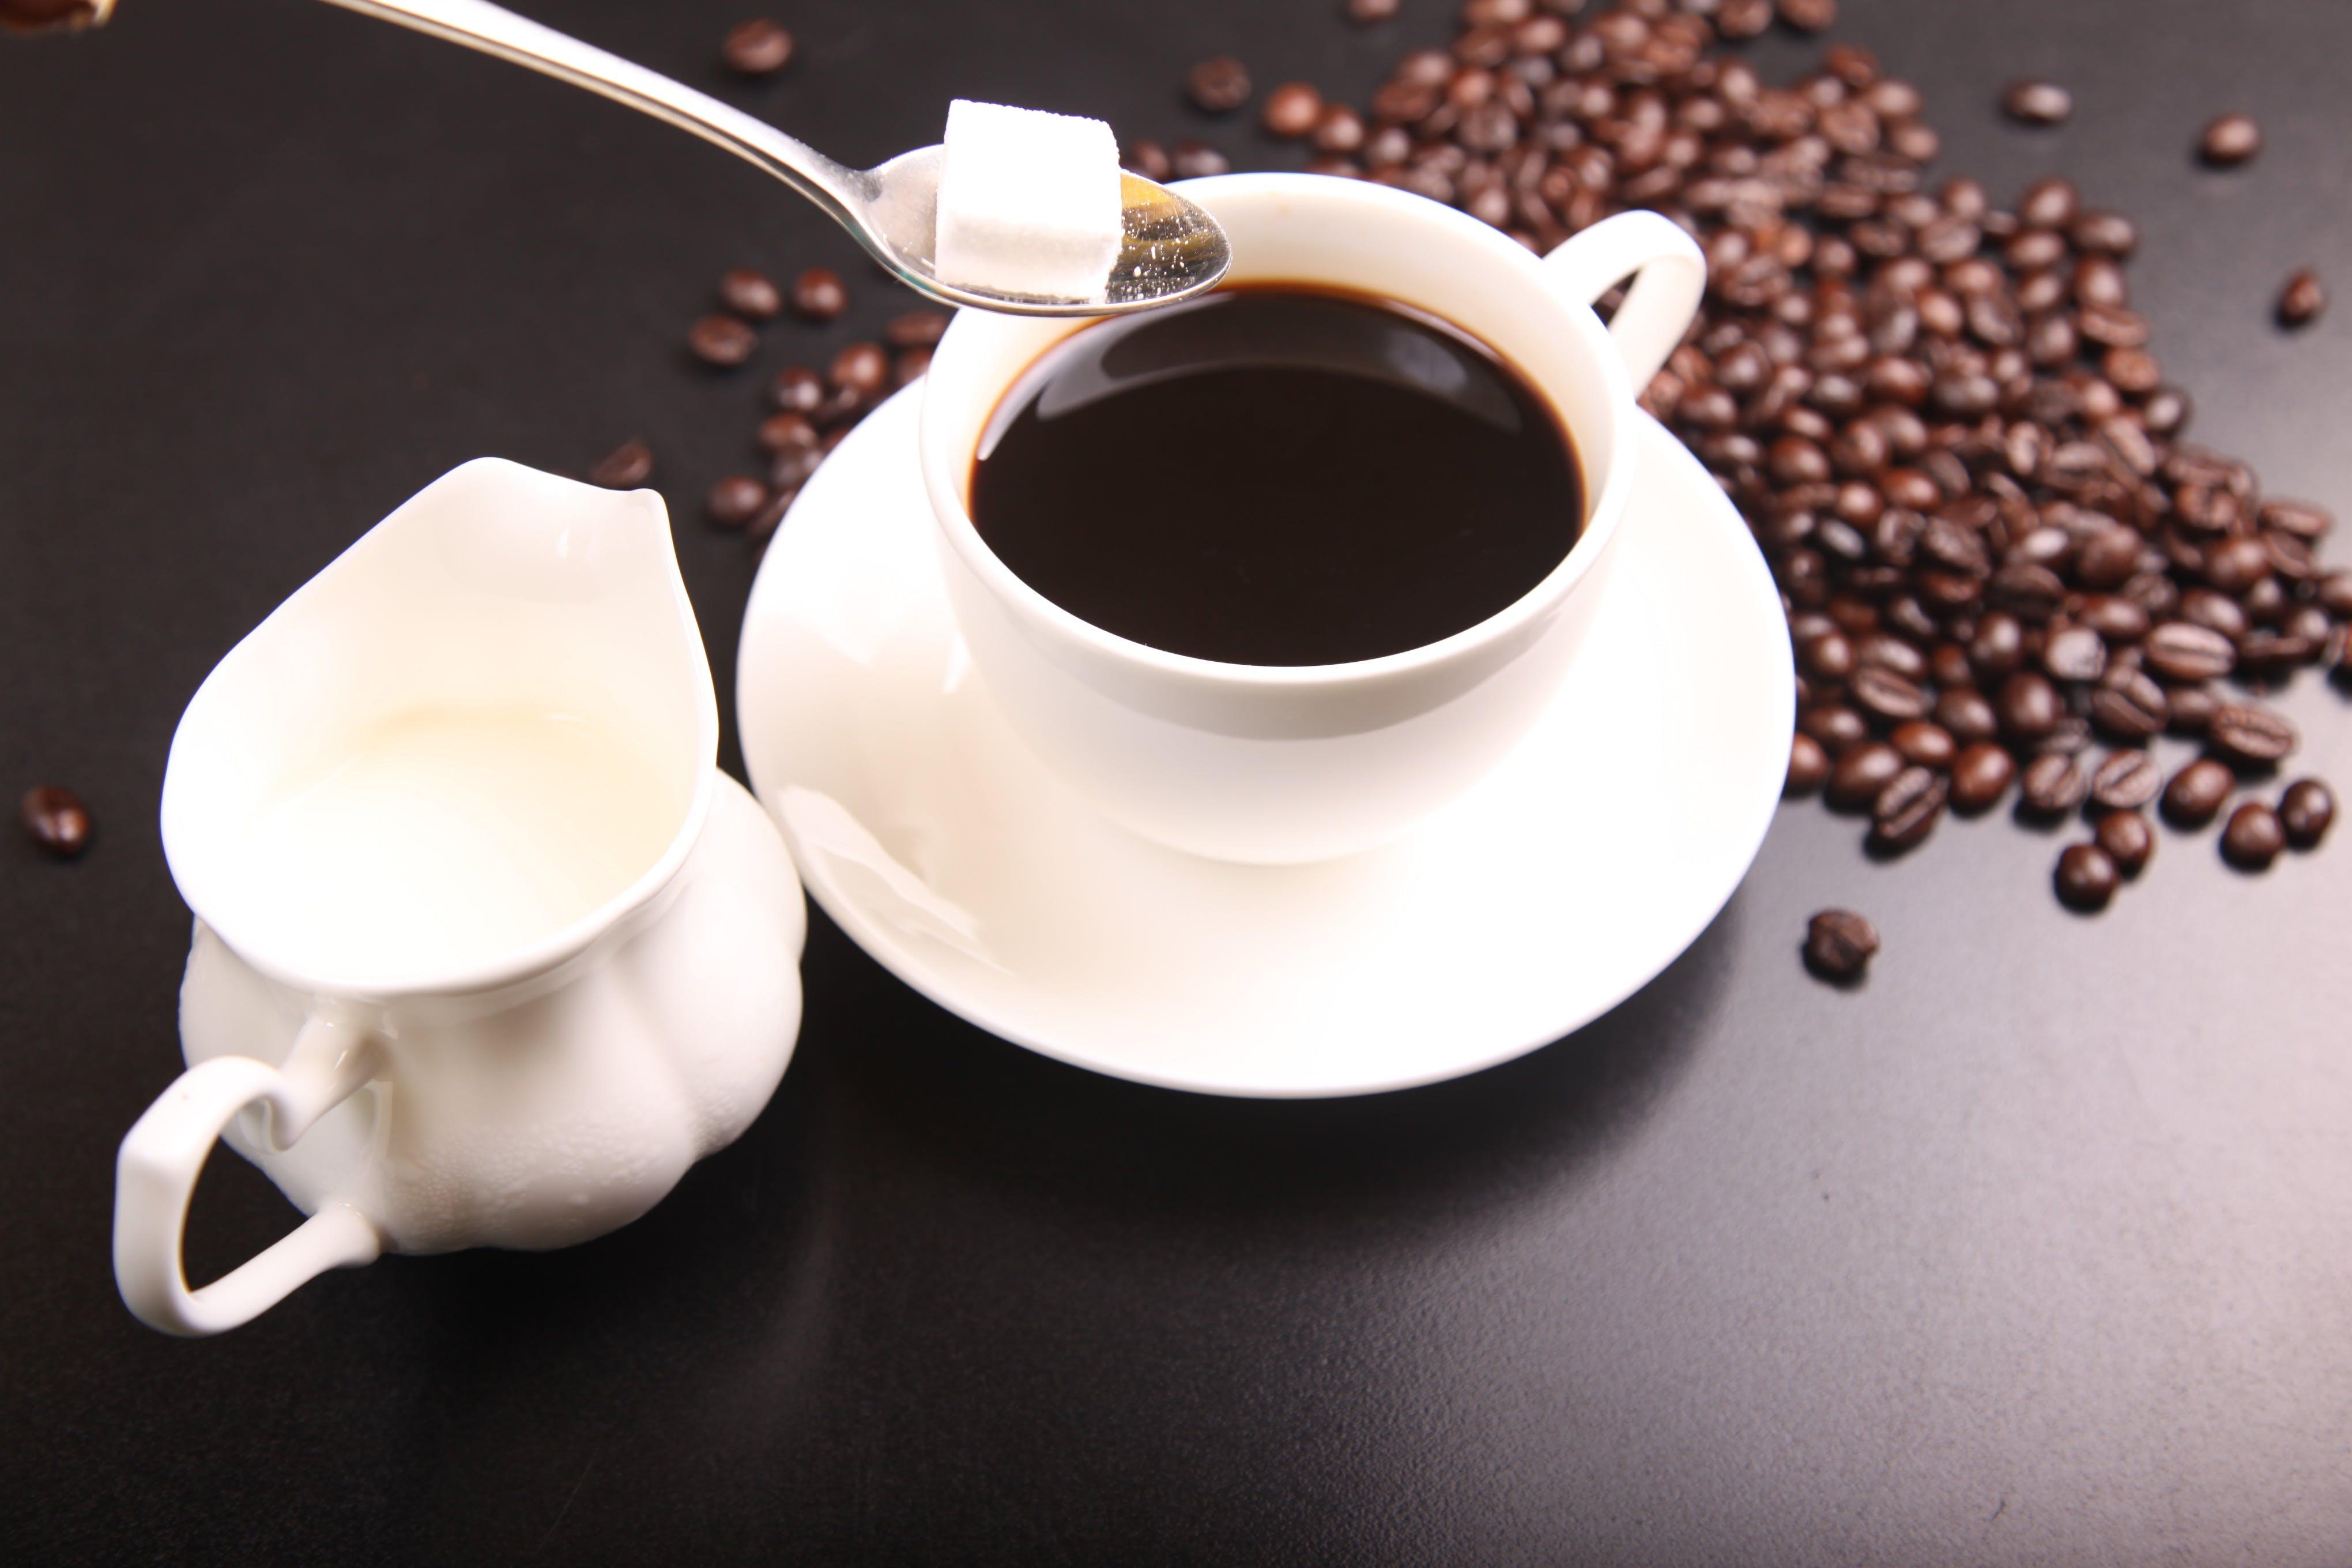 Free stock photo of restaurant, caffeine, coffee, sugar